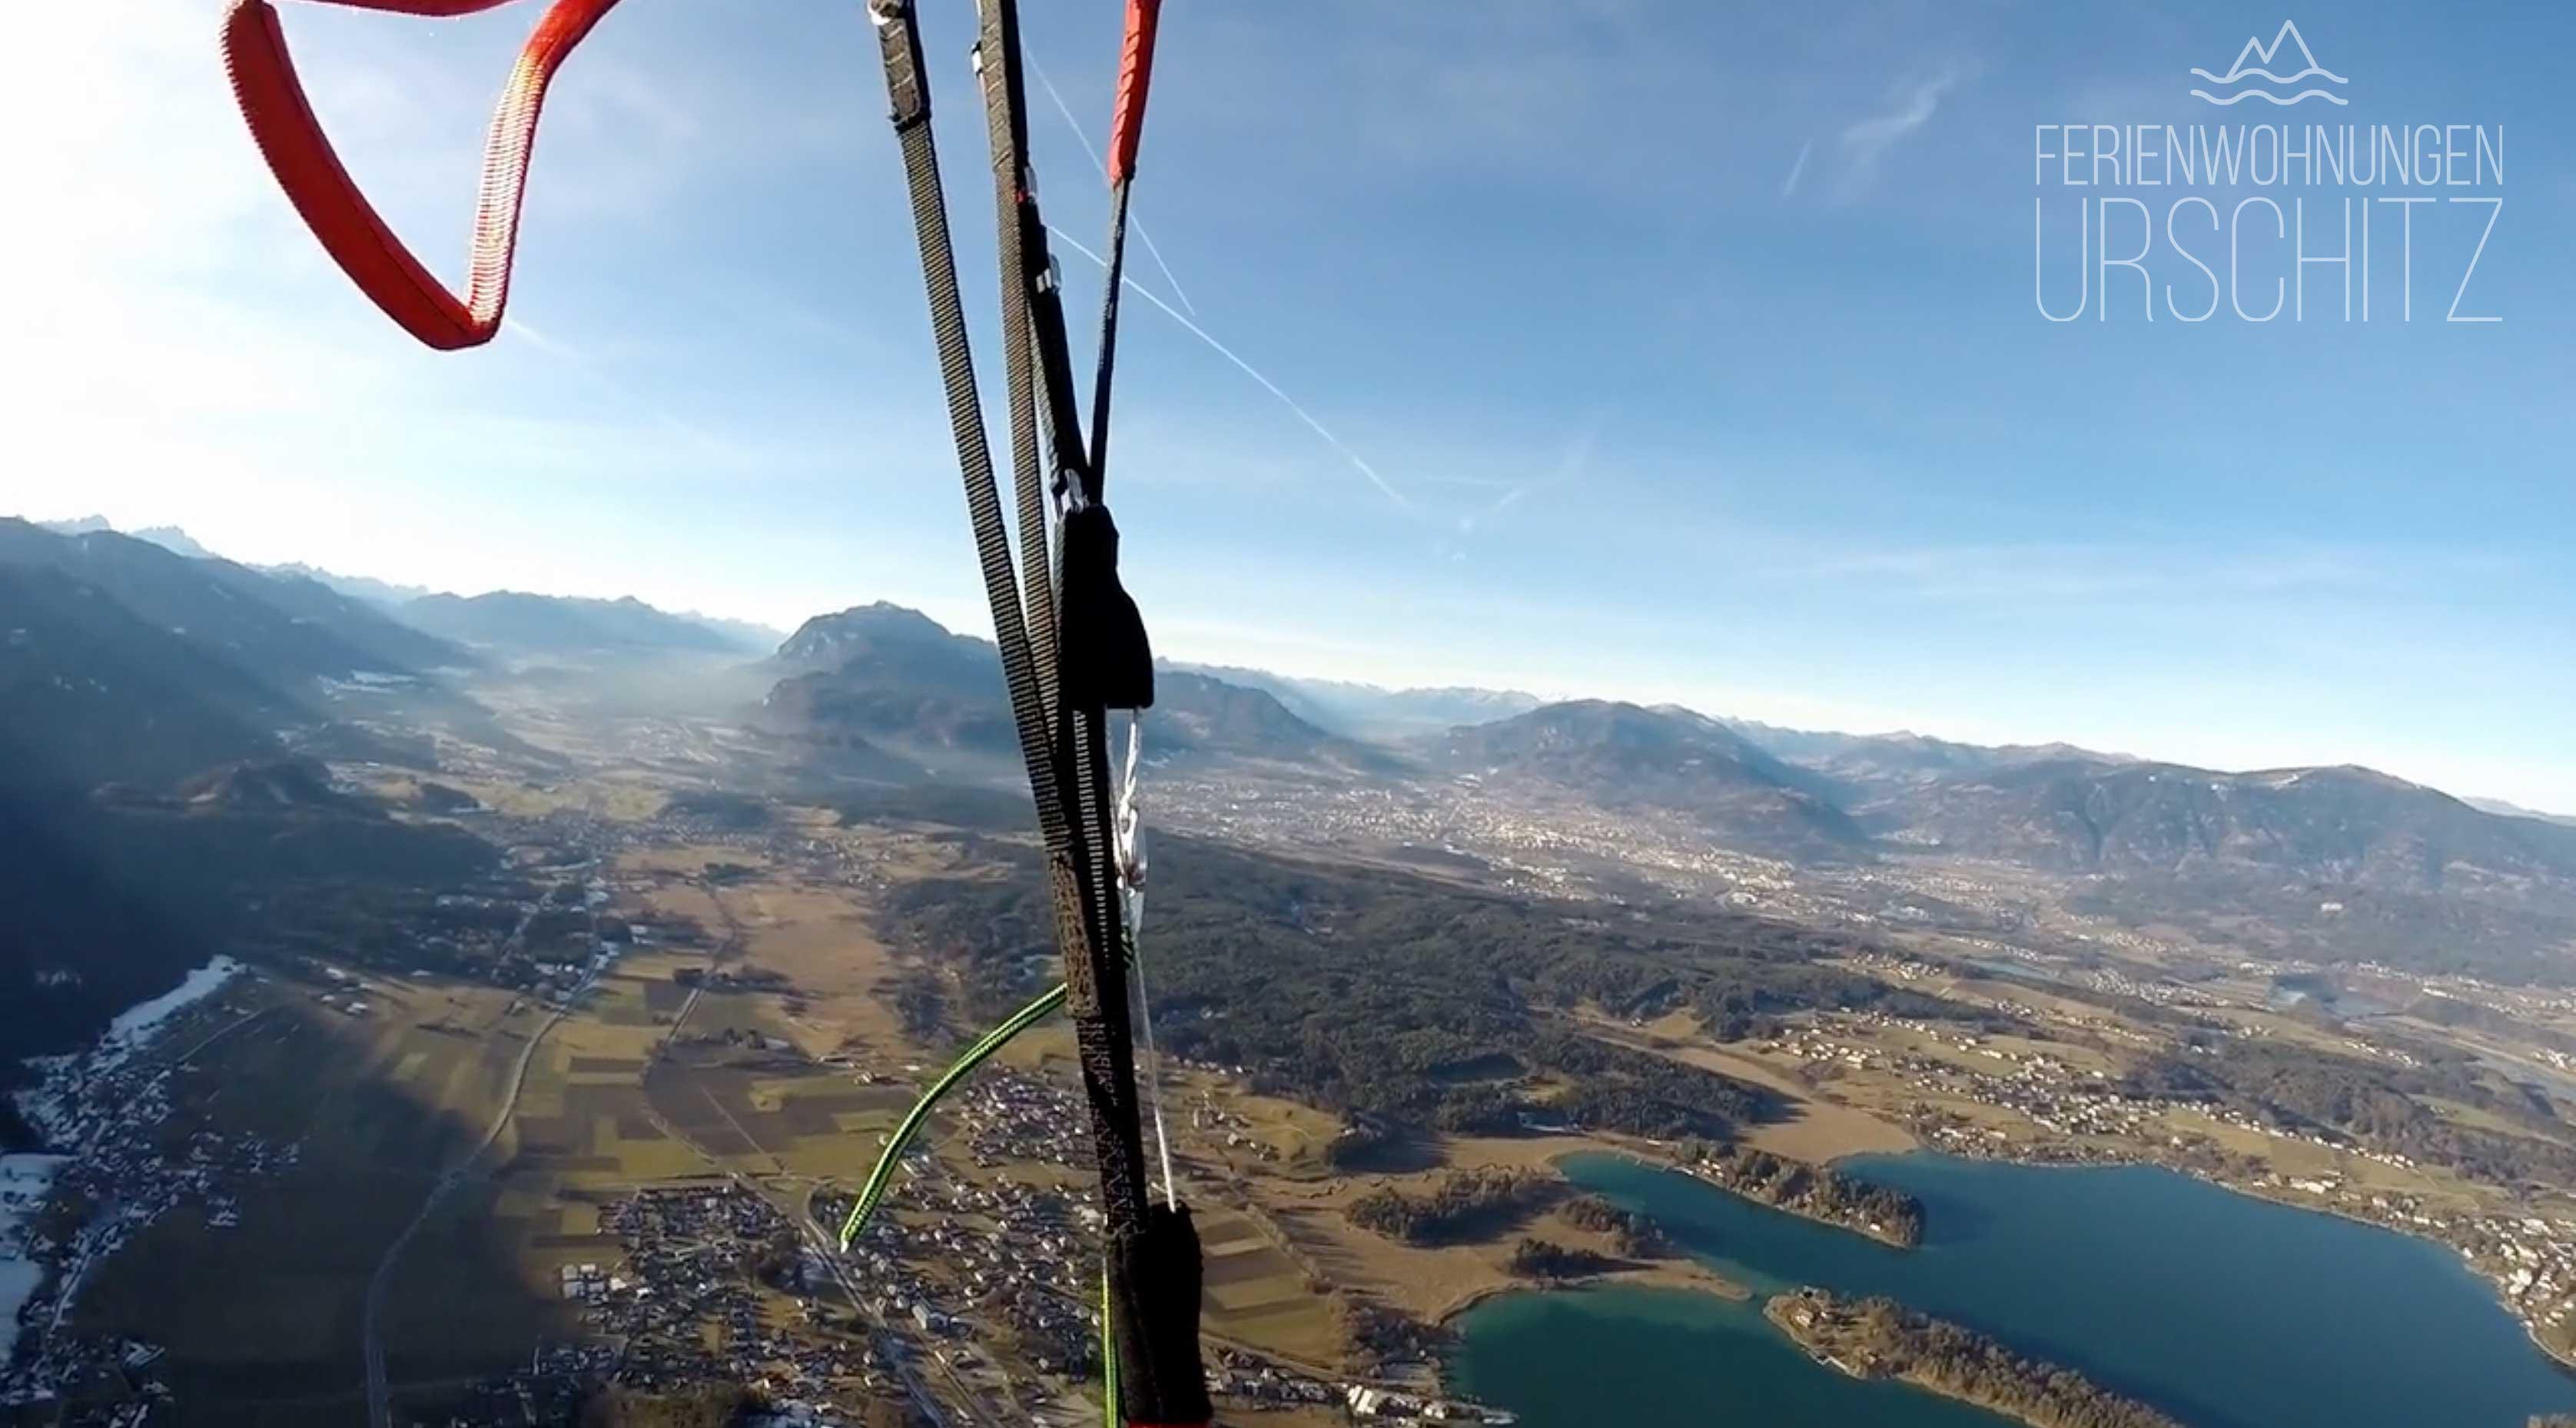 Paragleiten: Hike & Fly Tour Mittagskogel, Faaker See Flug, Landung Drobollach/Ferienwohnungen Urschitz.